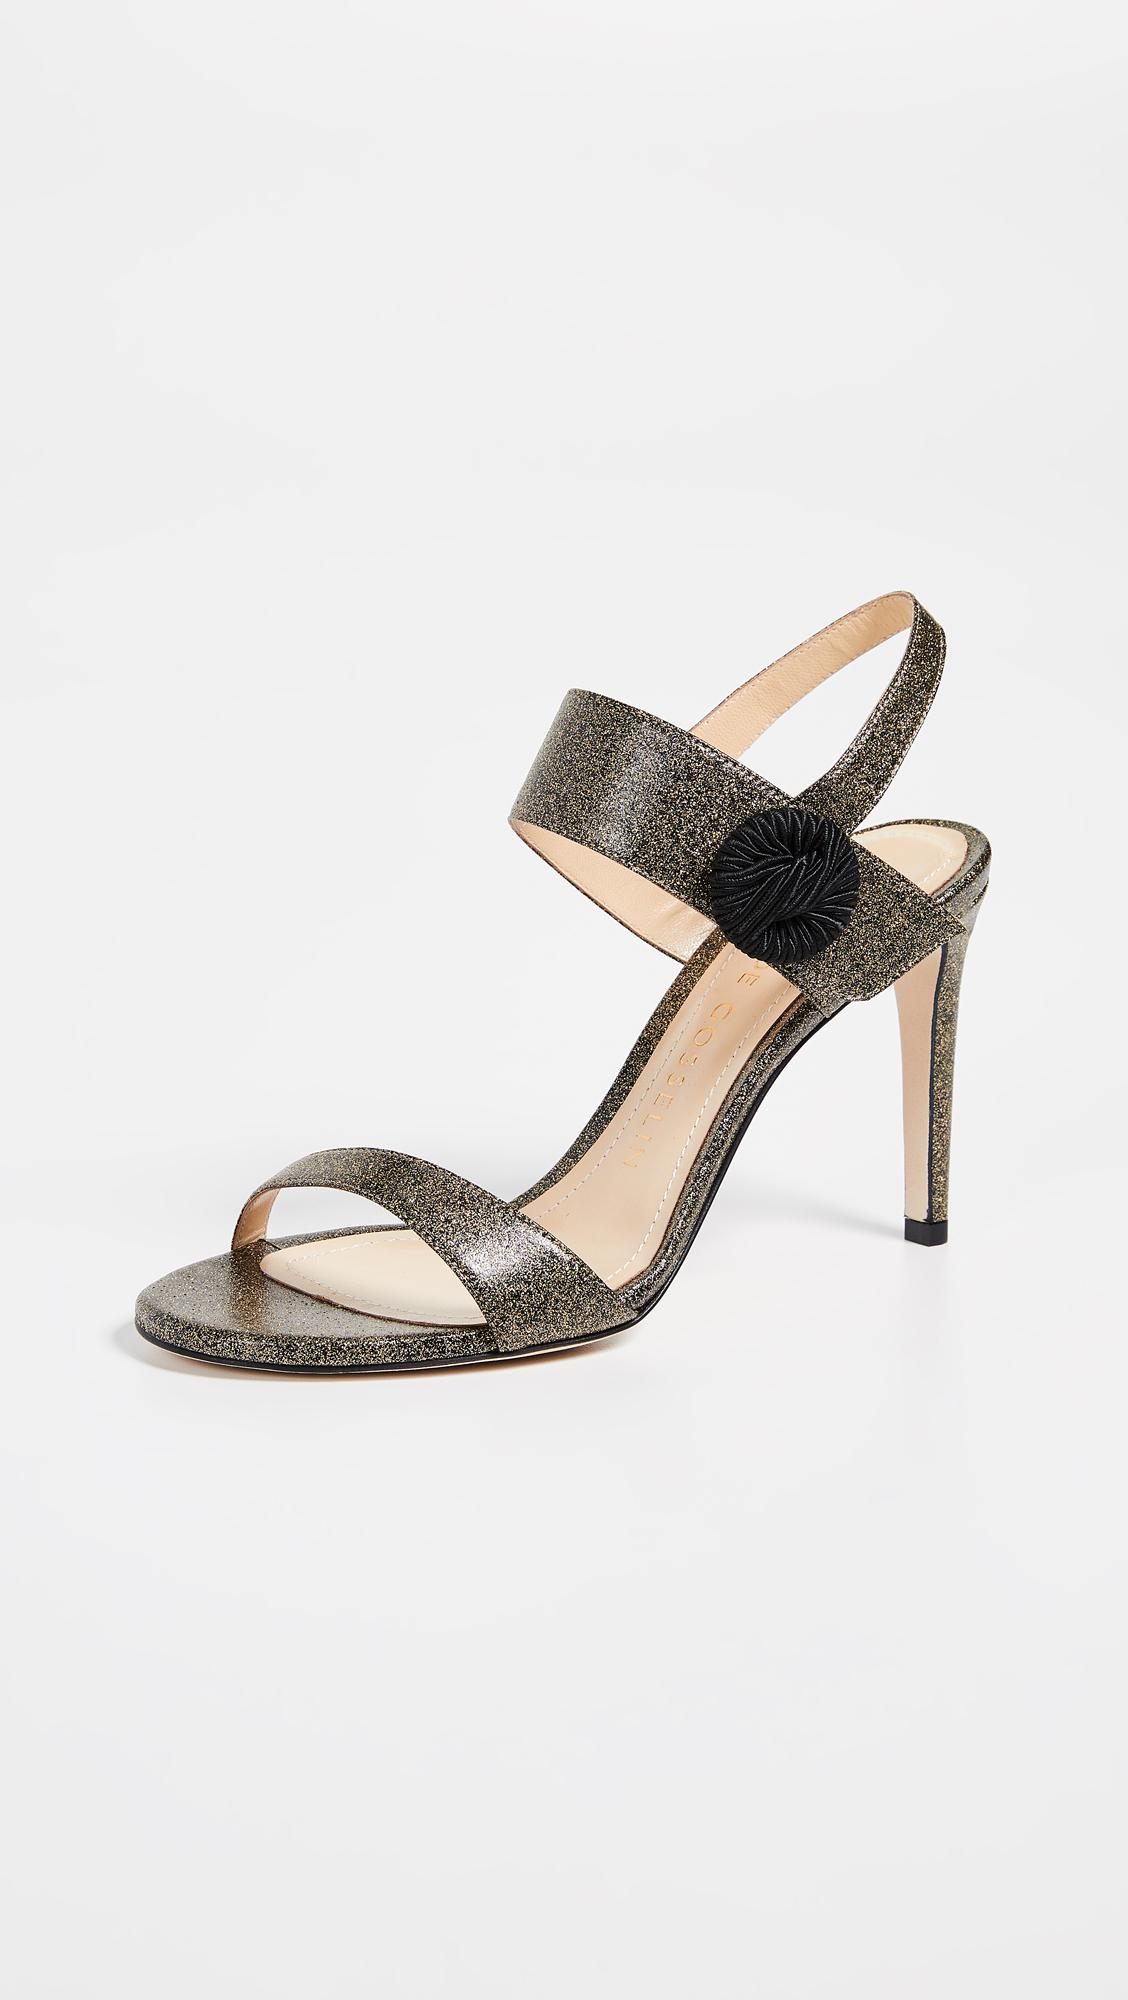 e7af95290fb9cf Chloe Gosselin. Women s Metallic Tori 90 Sandals. £656 From Shopbop